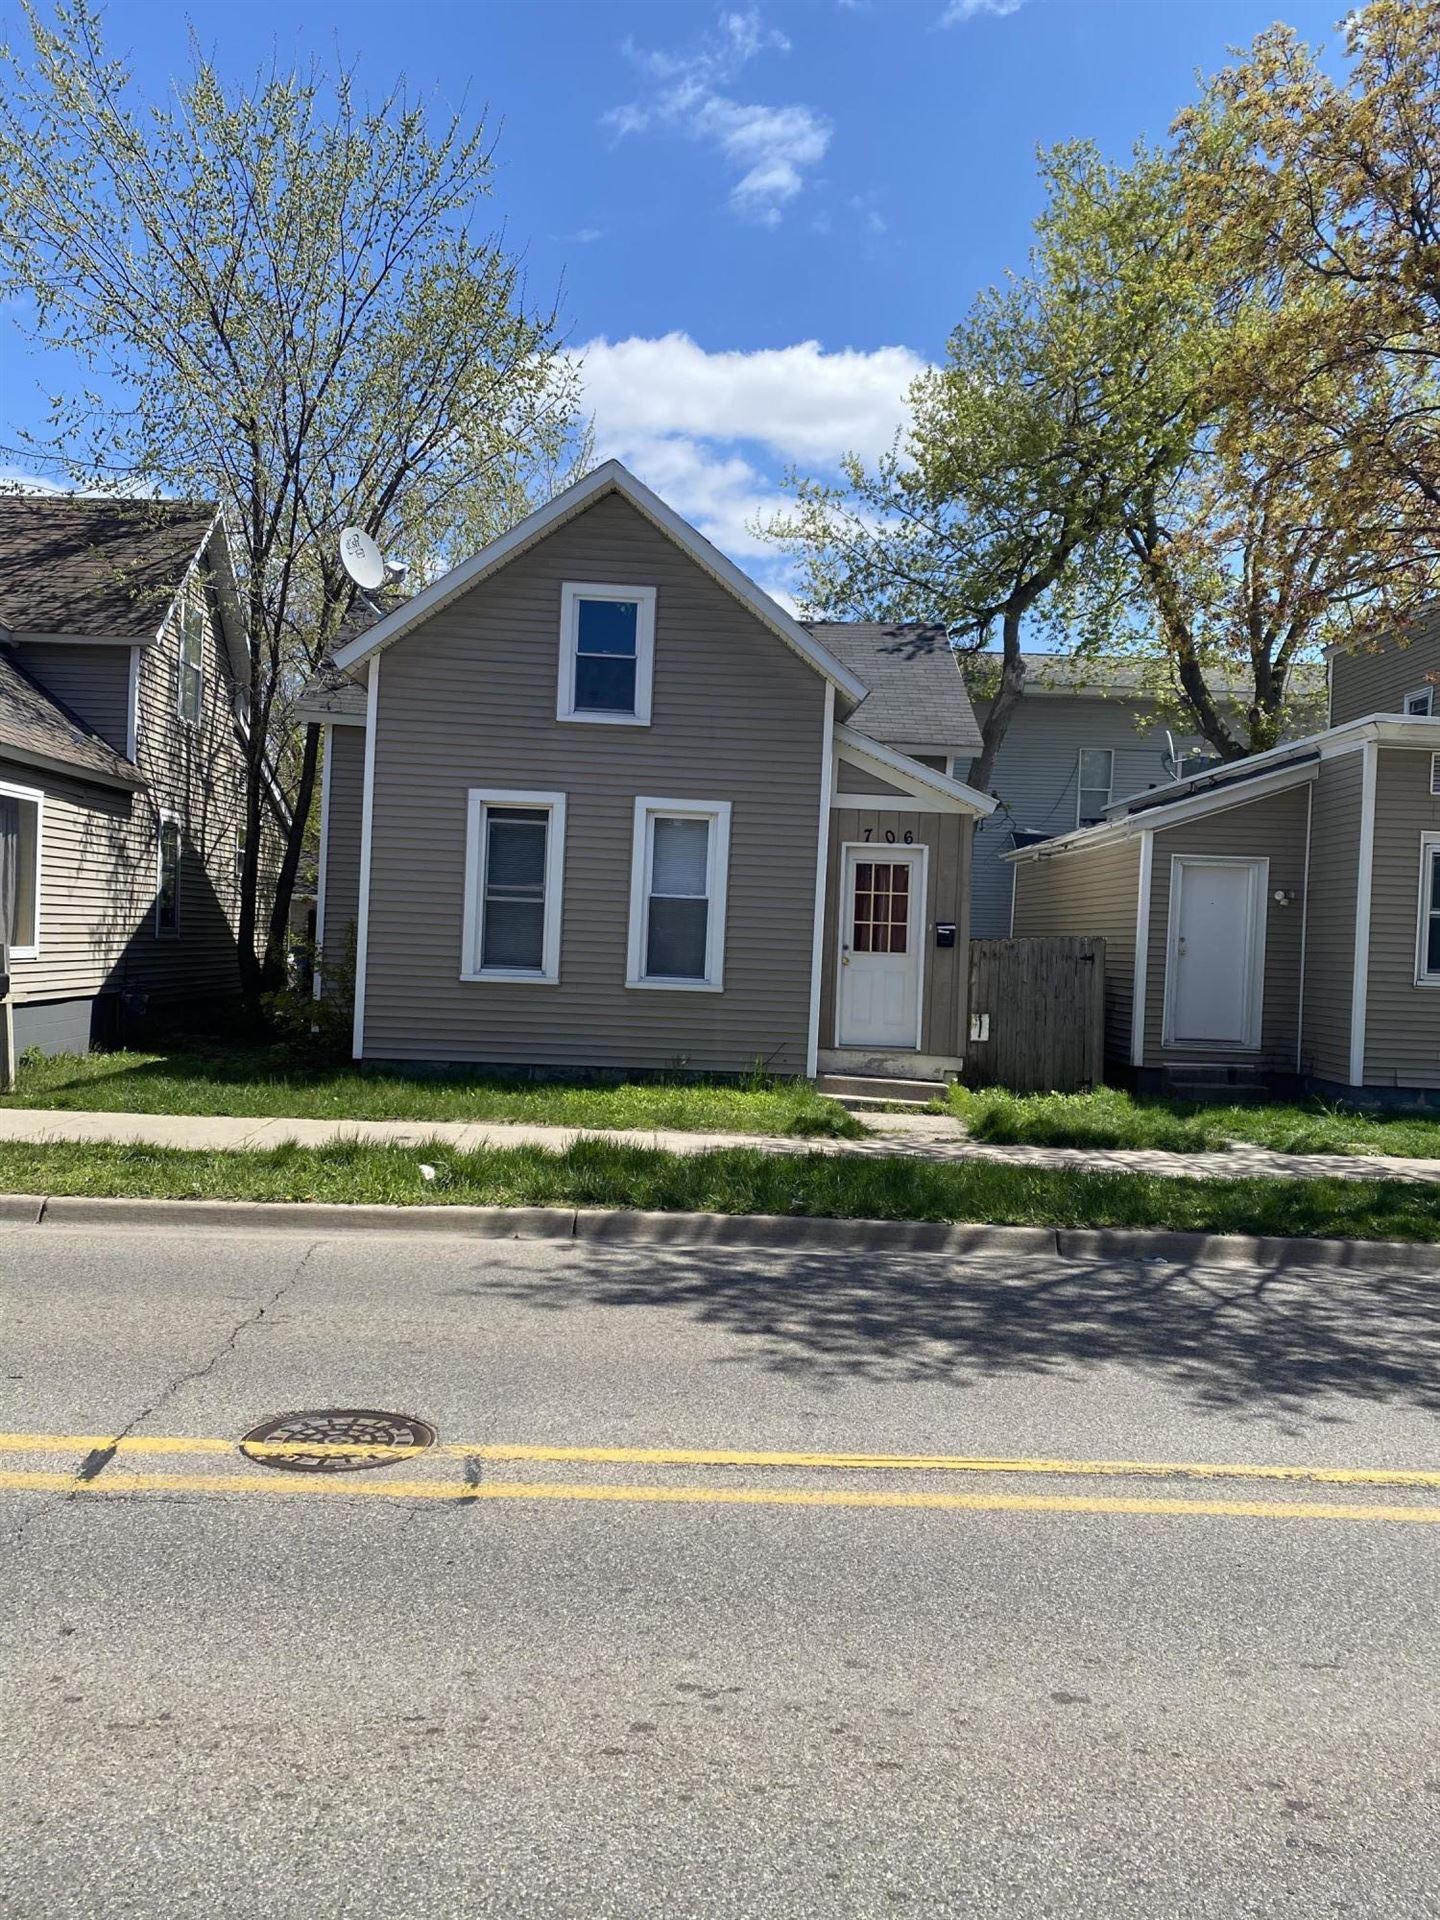 706 Alpine Avenue NW, Grand Rapids, MI 49504 - MLS#: 21014736